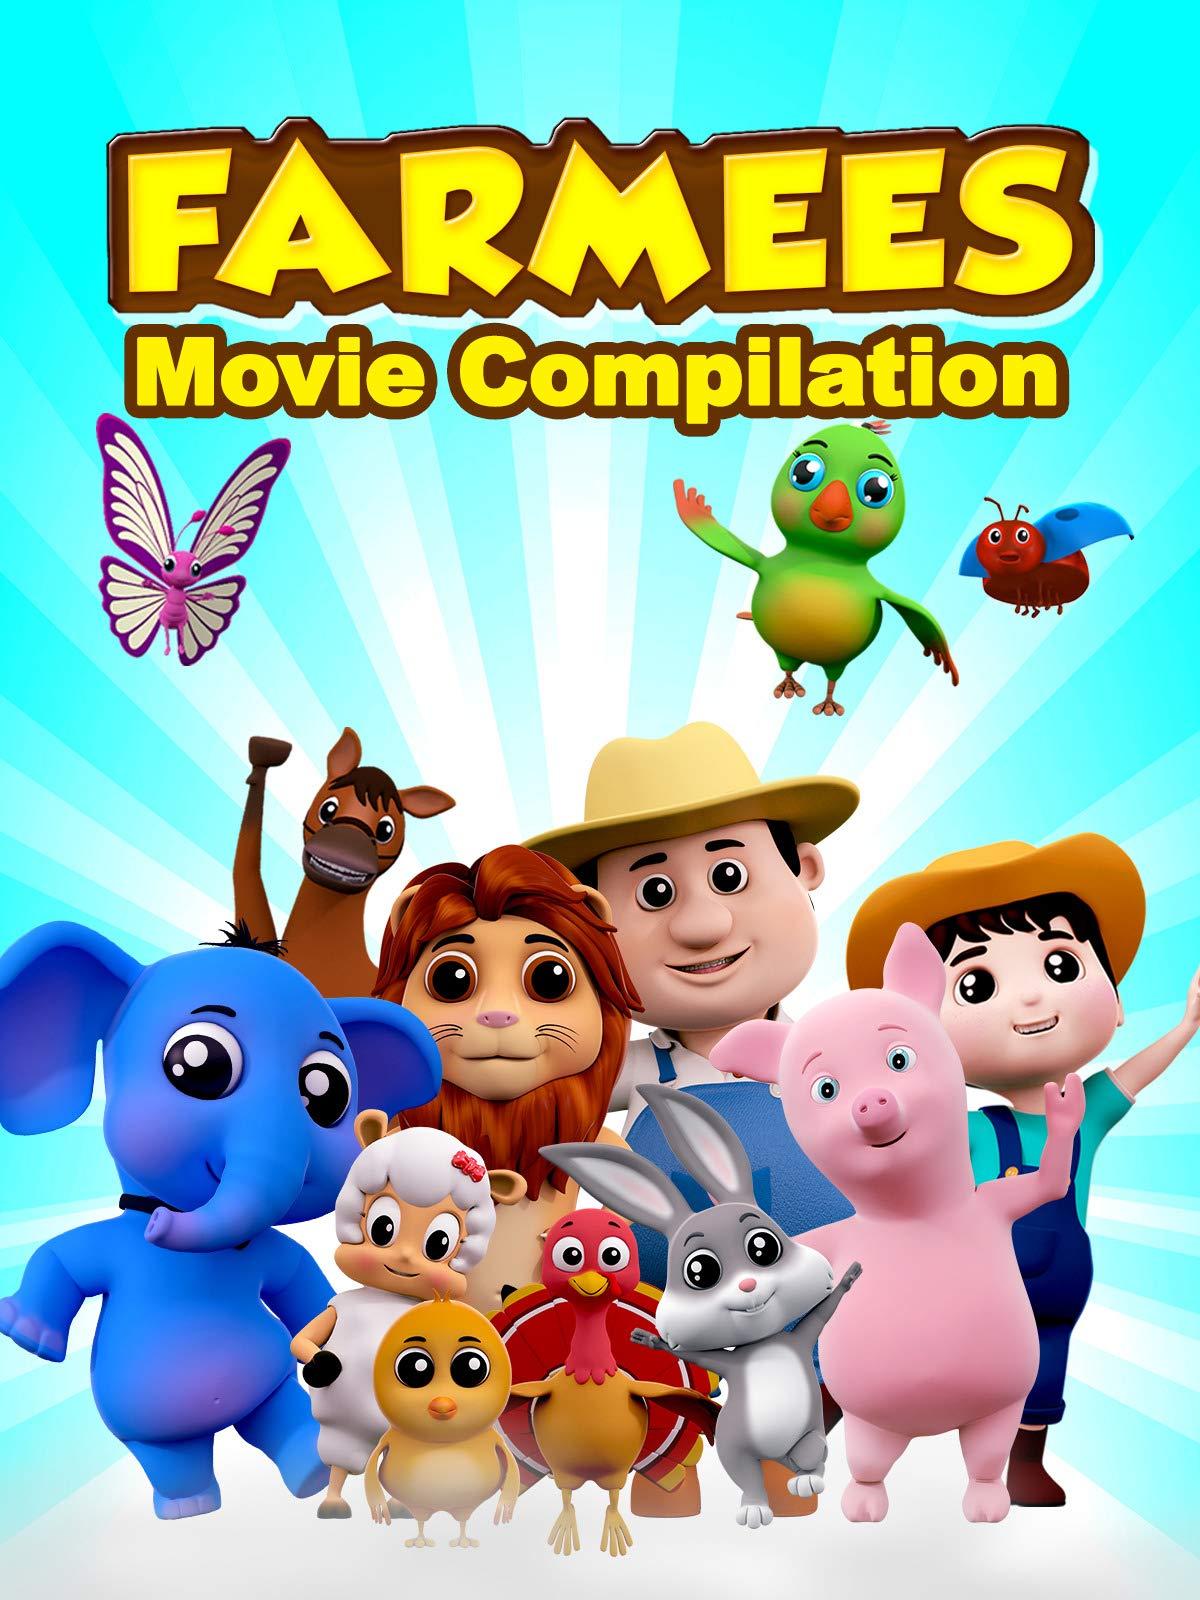 Amazon.com: Farmees Movie Compilation: USP Studios: Amazon Digital ...